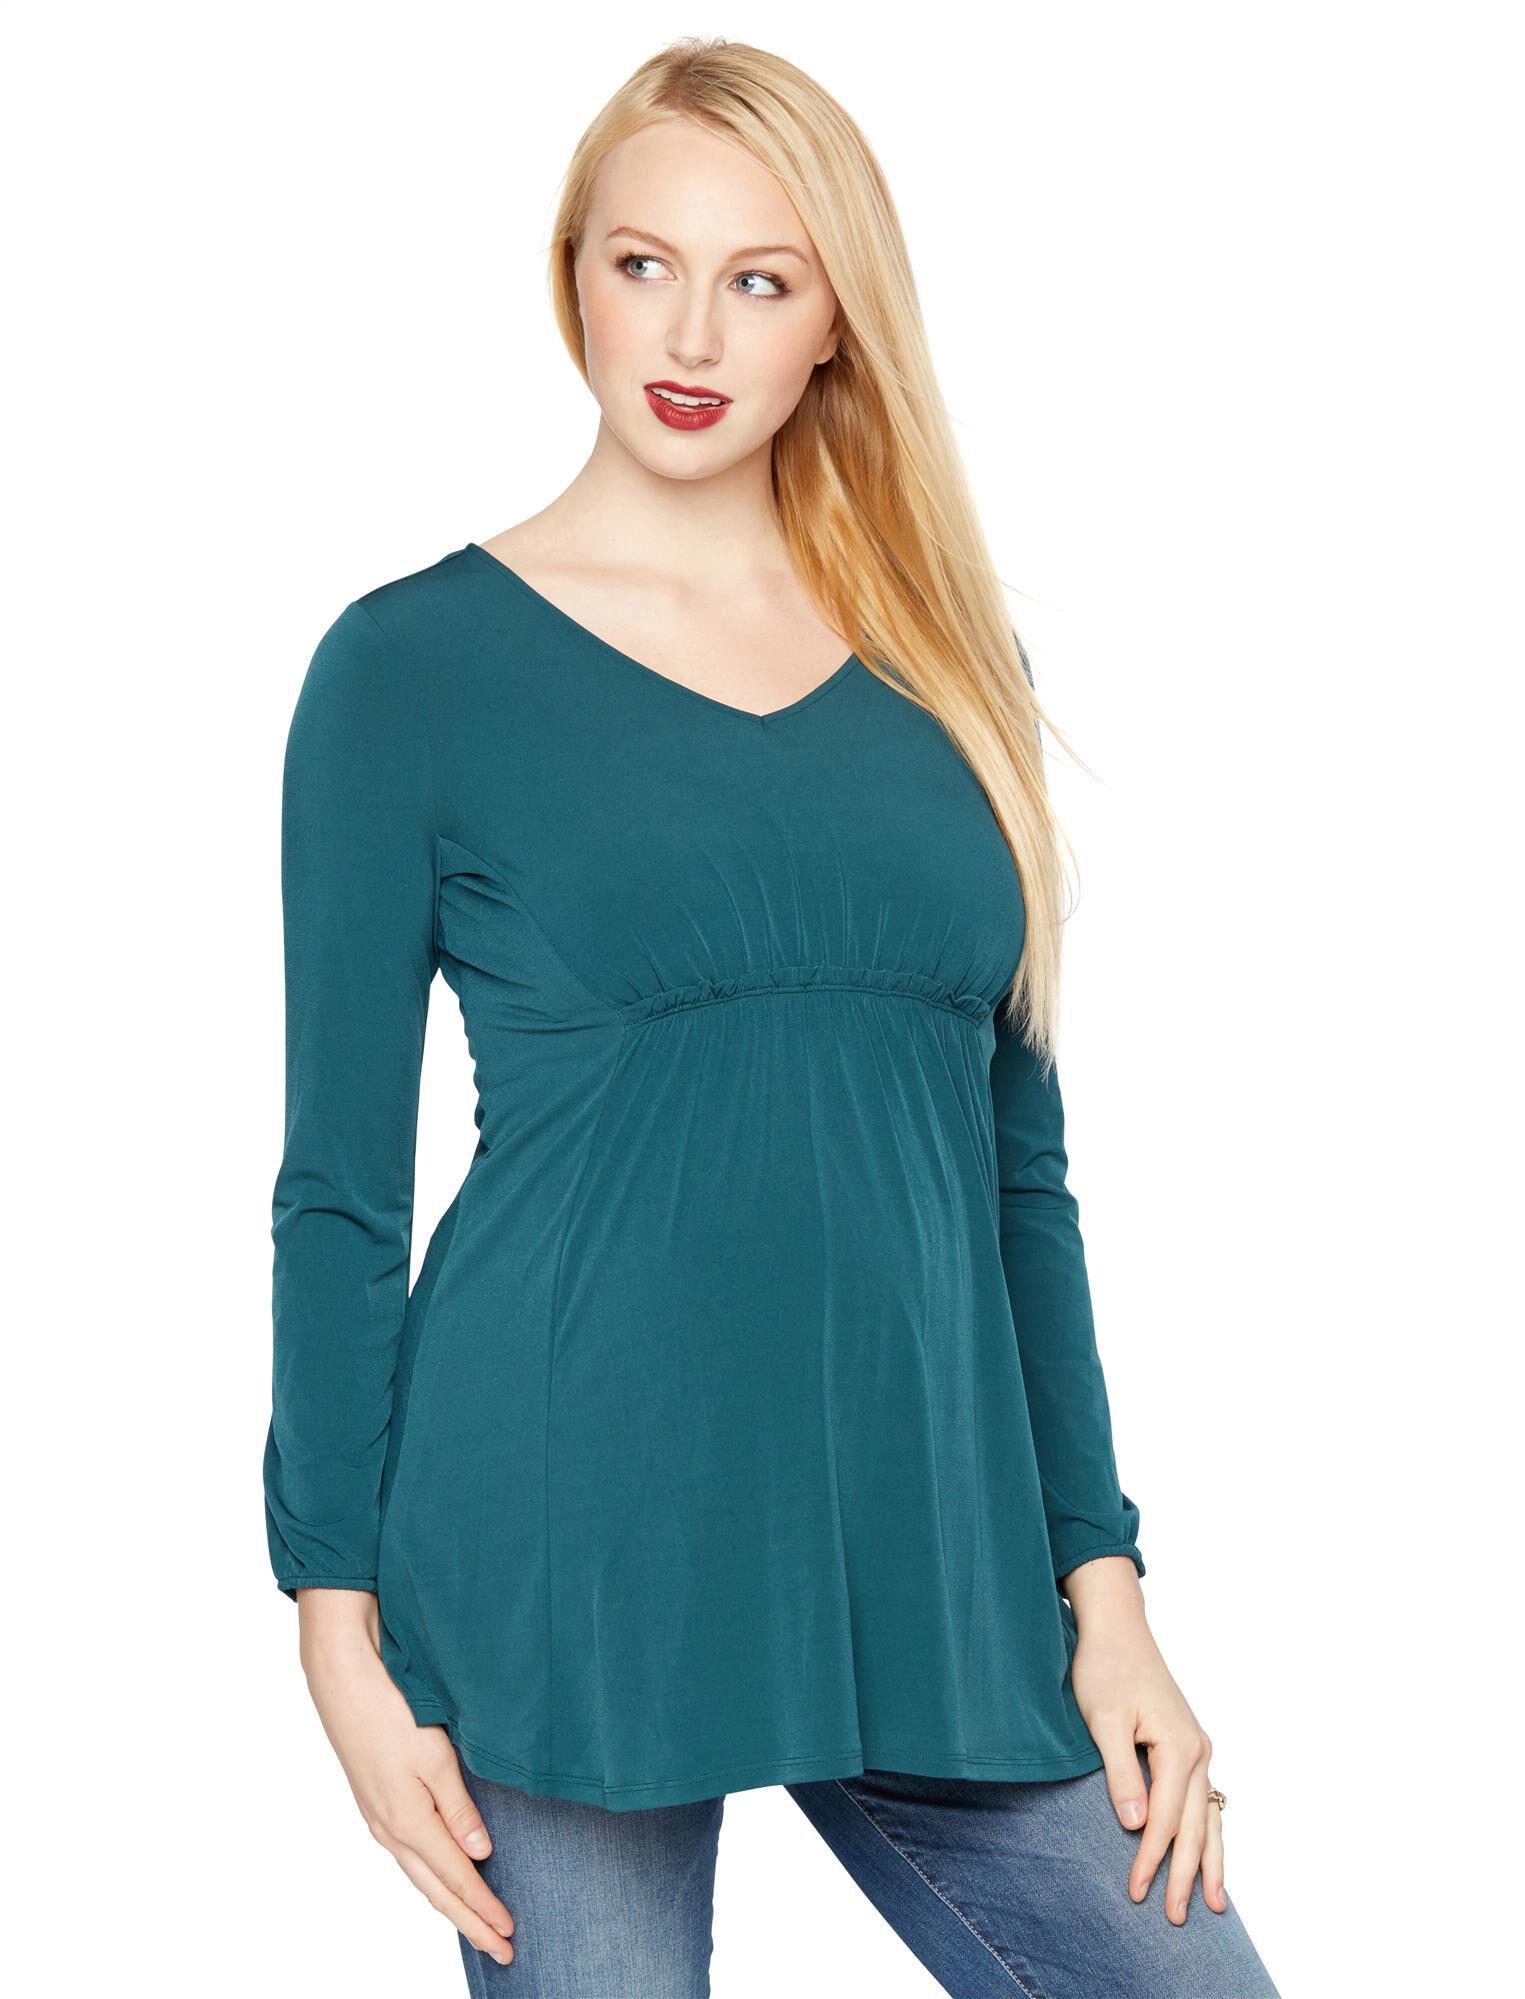 High-low Hem Maternity Tunic